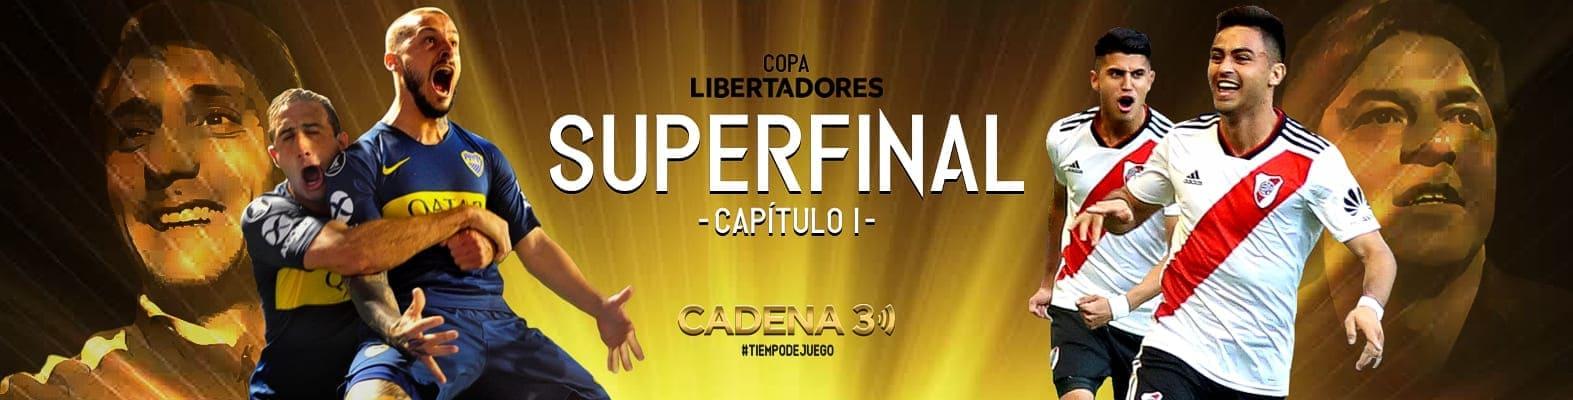 Superfinal Capítulo 1